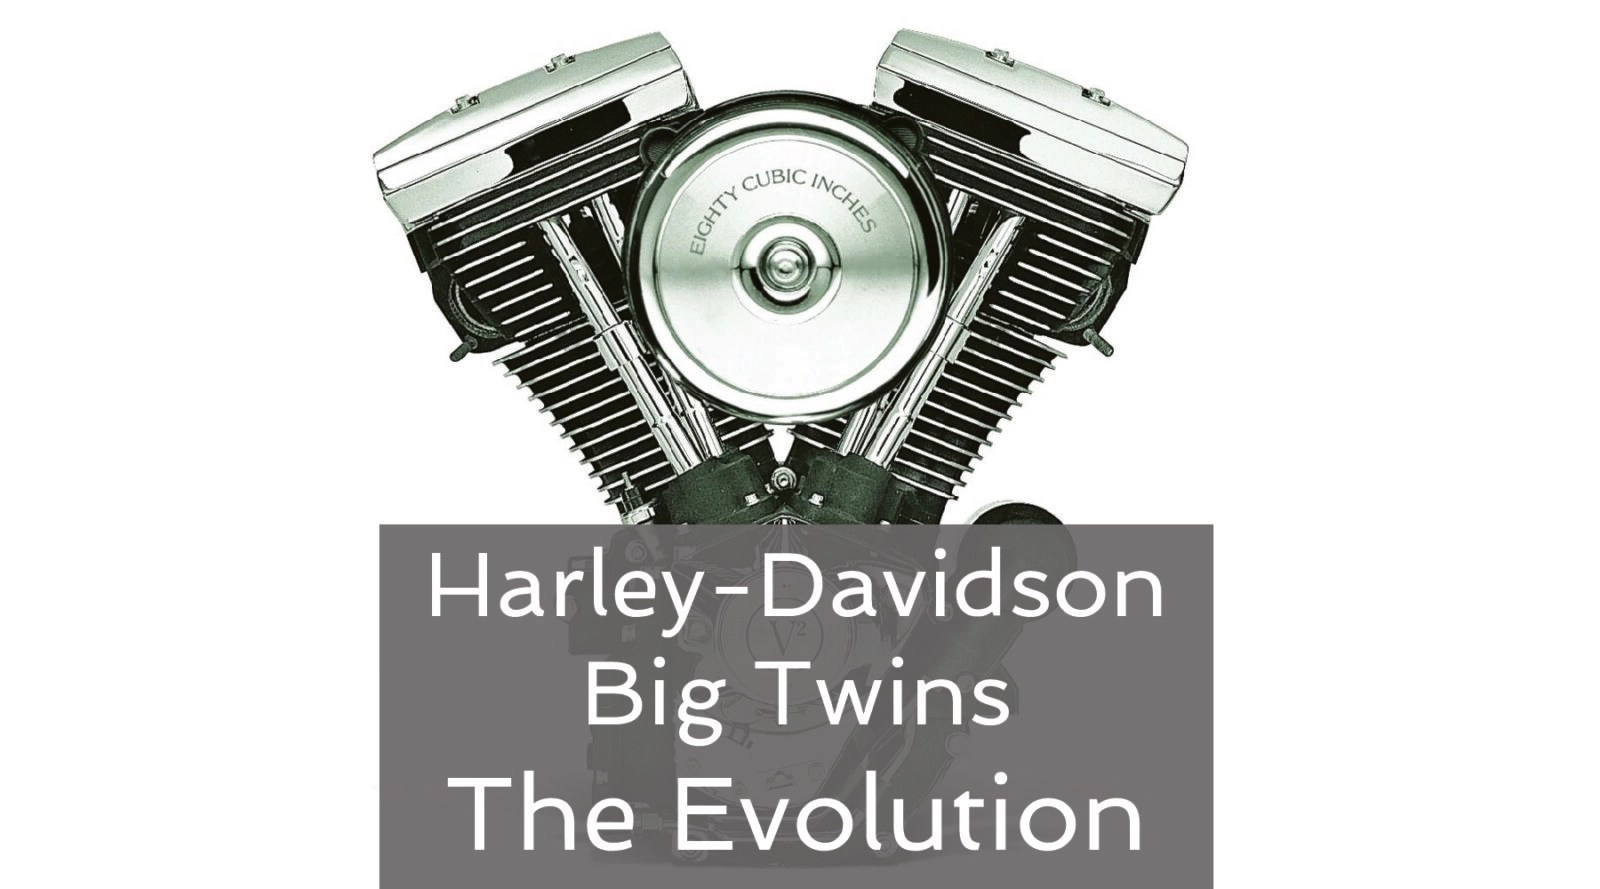 hight resolution of harley 1340 evolution engine diagram